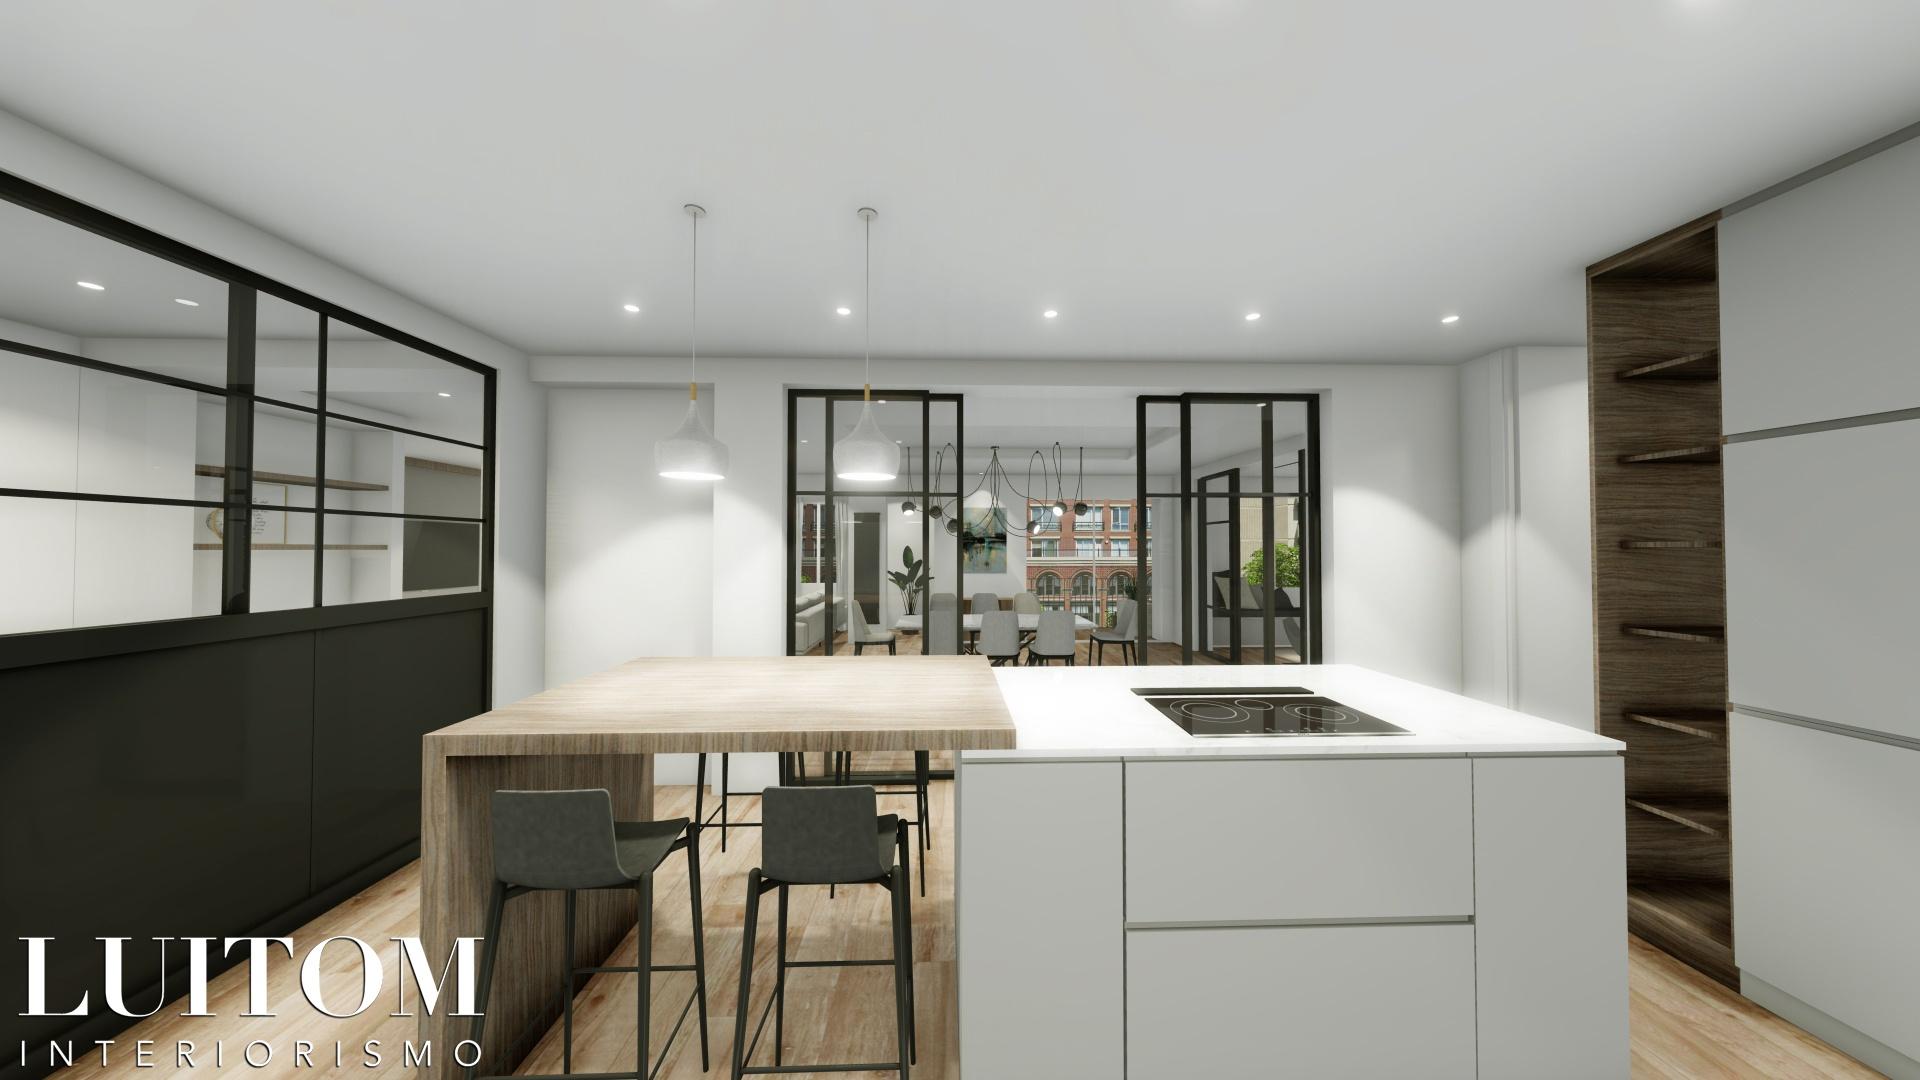 cristaleras-cocinas-pared-cristal-separacion-cocina-salon-cristalera-metalica-madera-blanca-negra-23